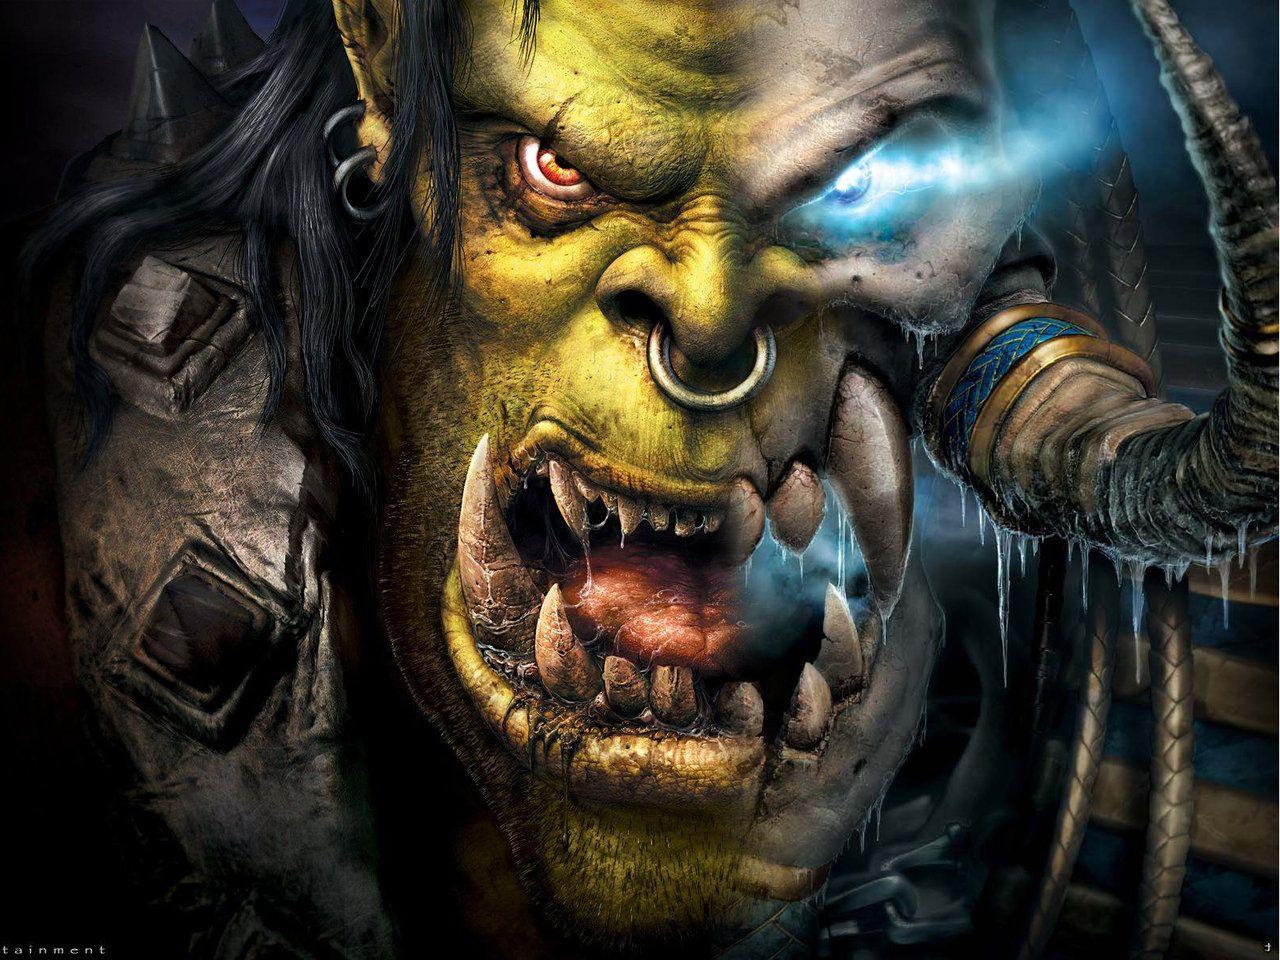 Warcraft Orc Vs Human By Mega1hs Warcraft Orc Warcraft Art